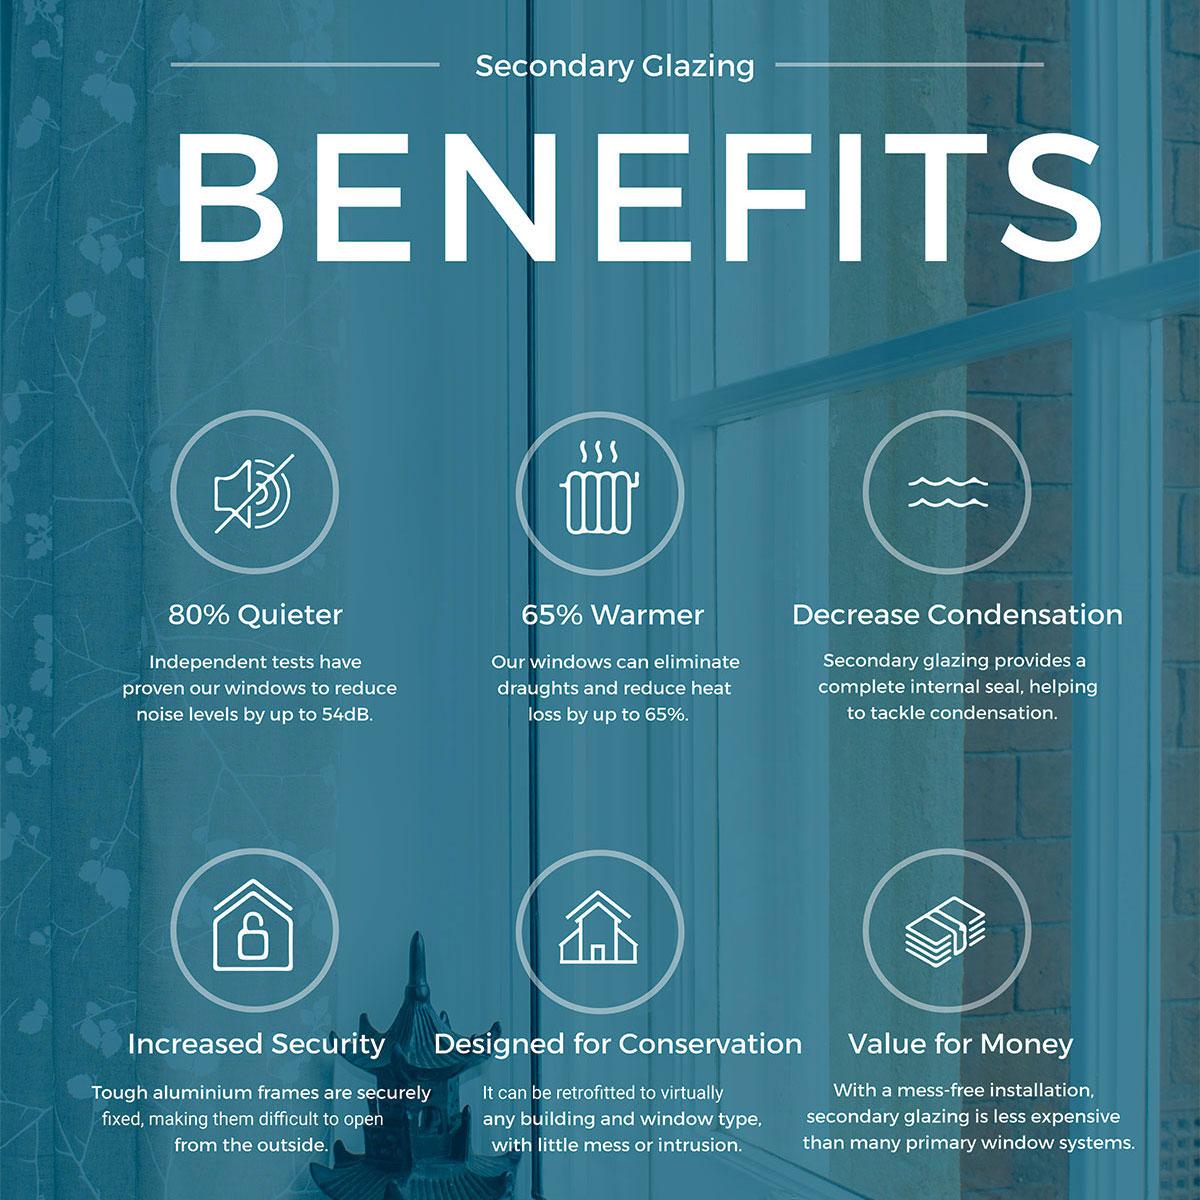 Secondary Glazing benefits